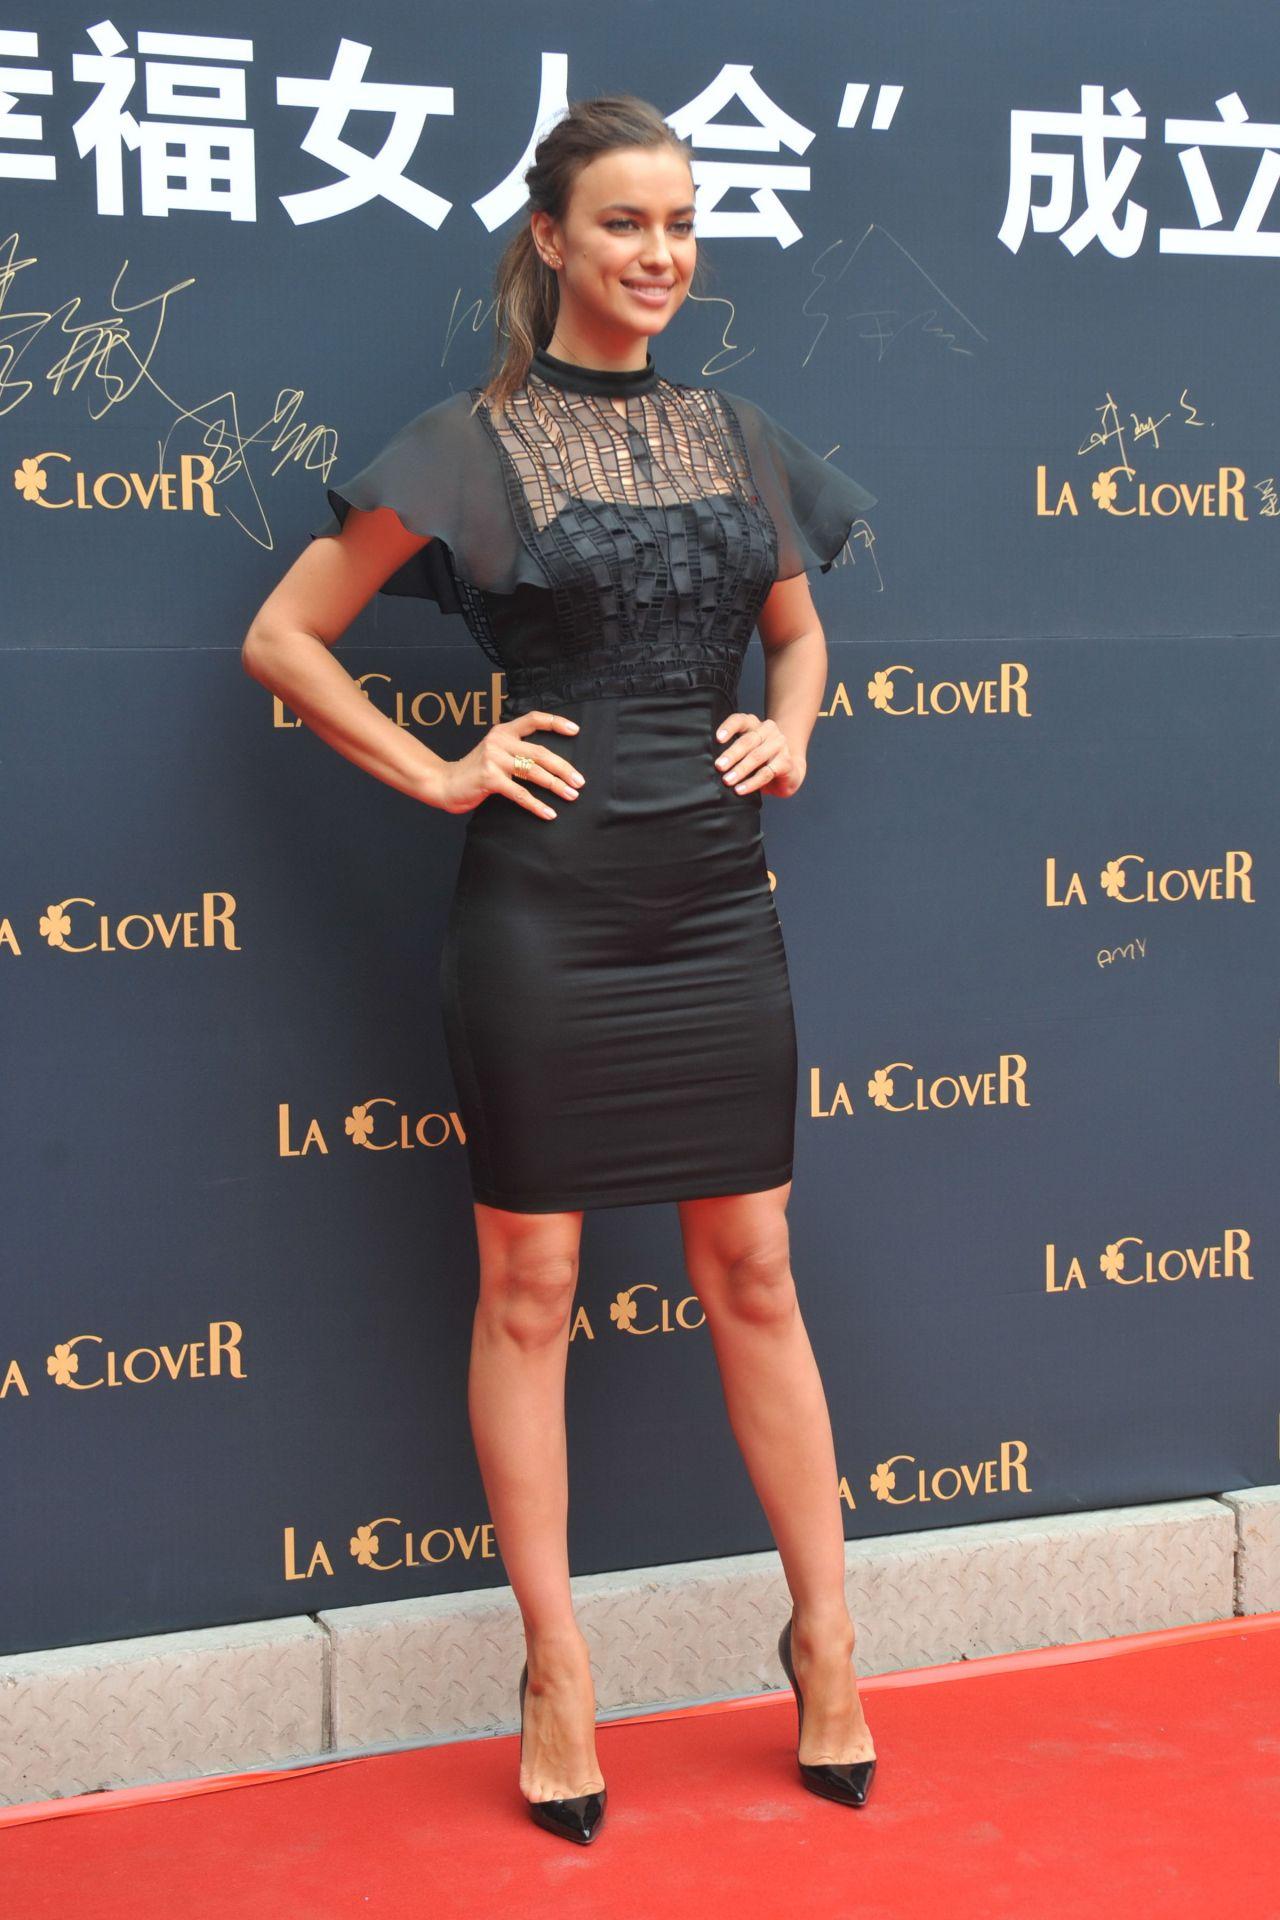 ��� ������ ���� �� ��� ������ ���� La Clover �� ���� 2014